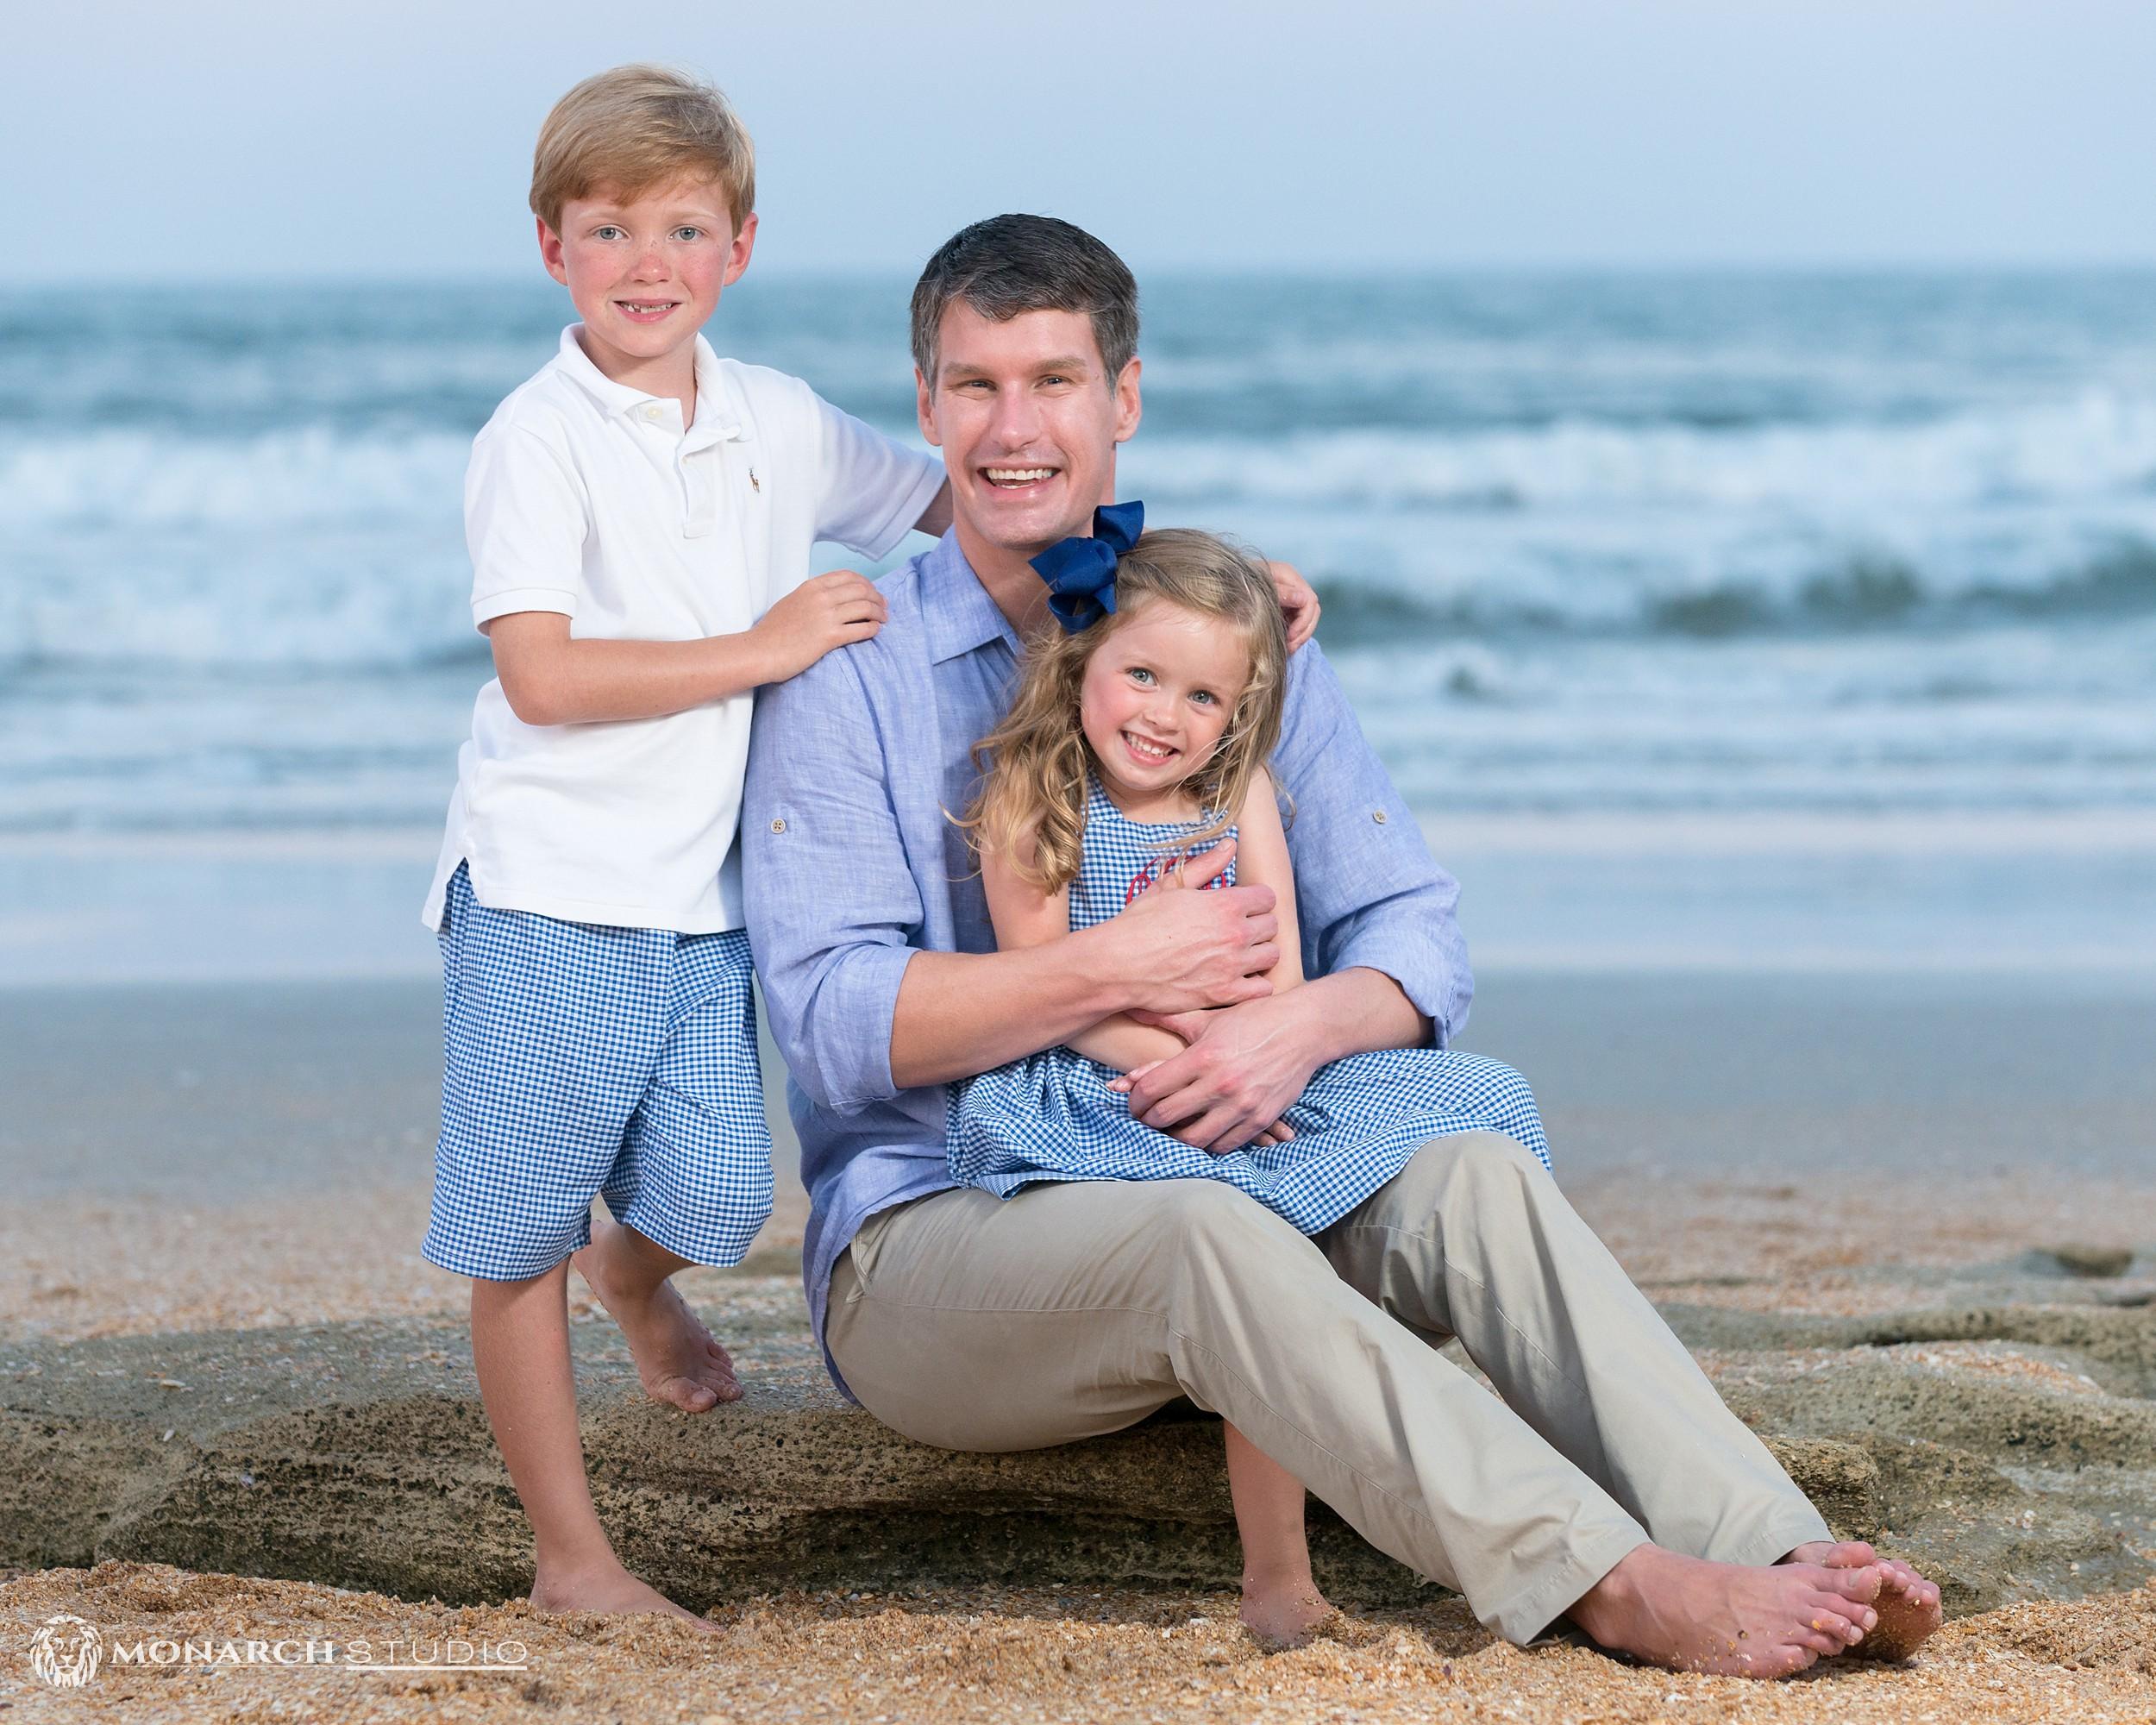 St-Augustine-Beach-Family-Portrait-Photographer_0019.jpg